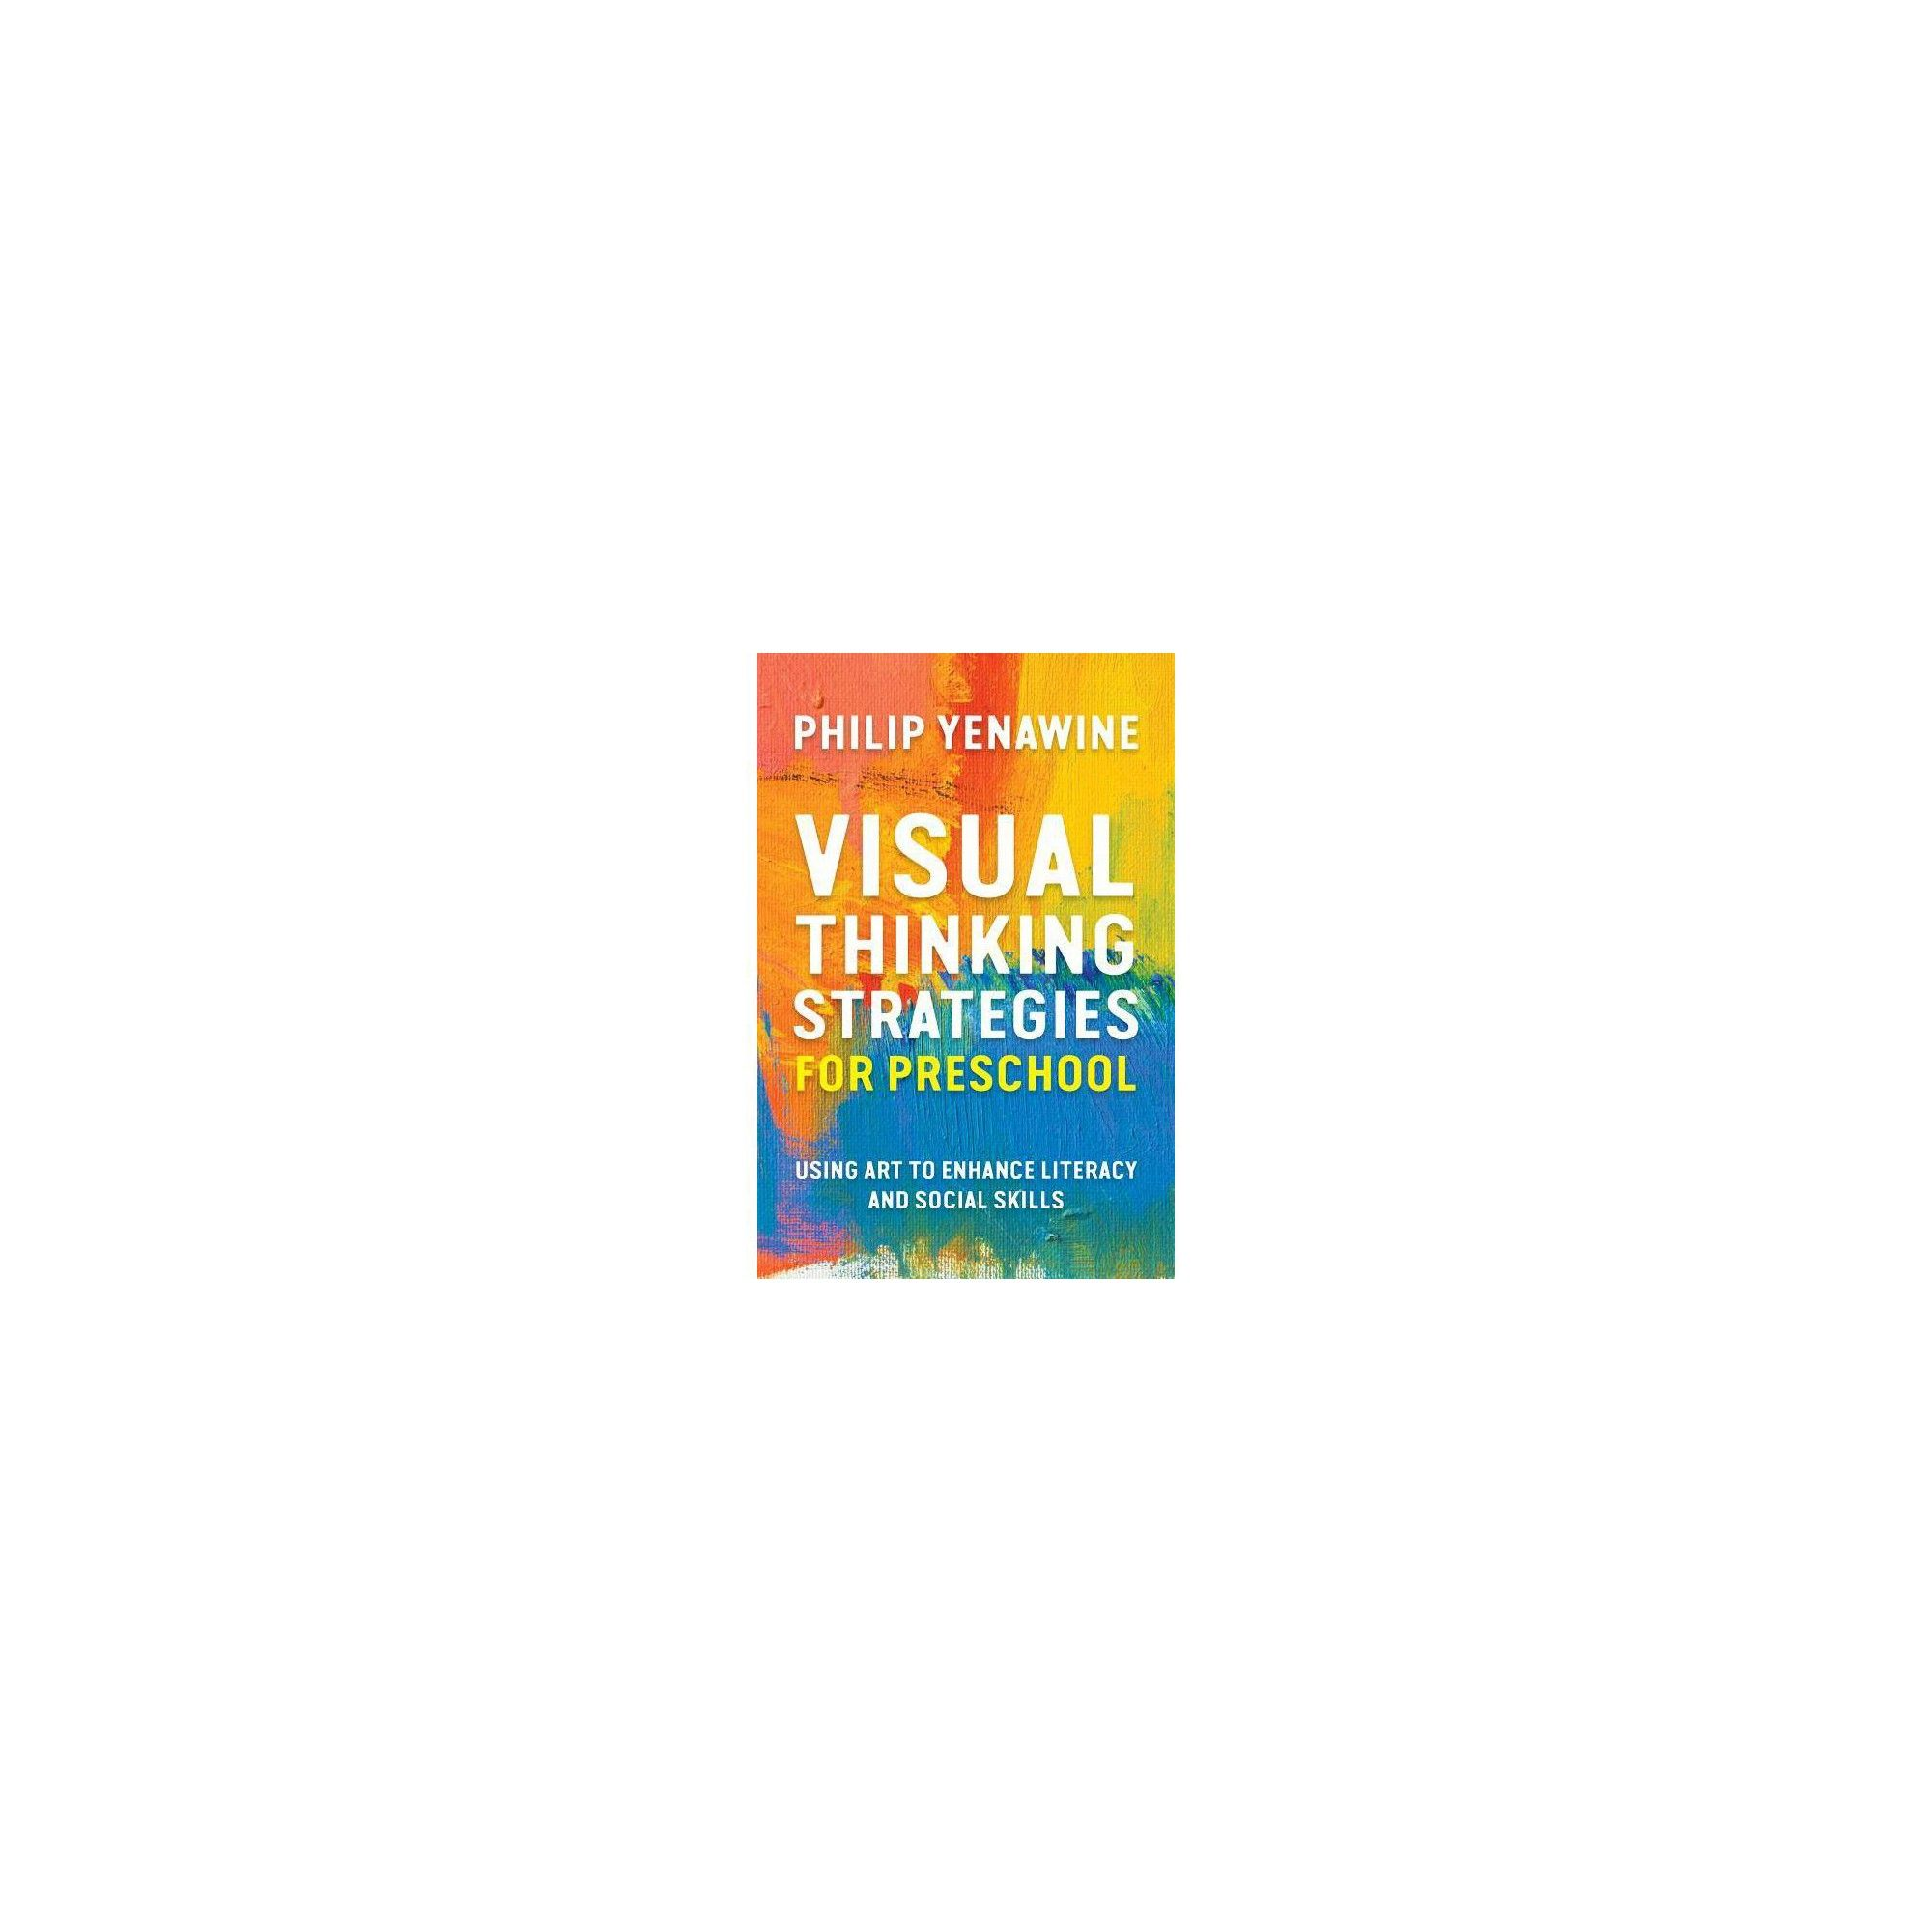 Visual Thinking Strategies For Preschool